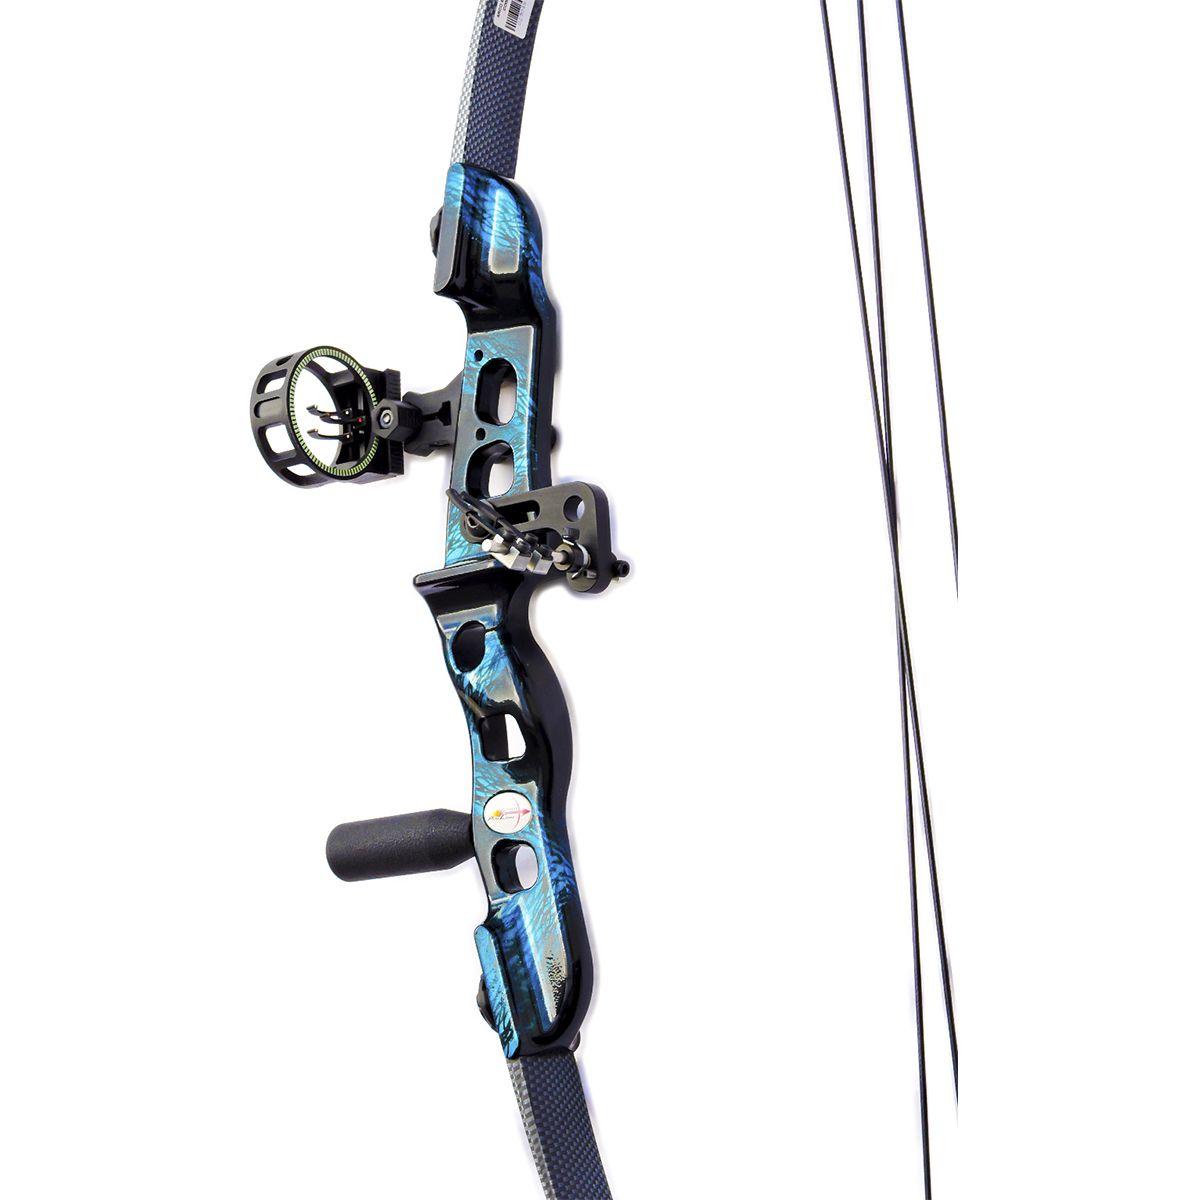 Arco e flecha Catfish Vixion kit plus Composto + Mira B30010 + Rest B10002K + Estabilizador EST1